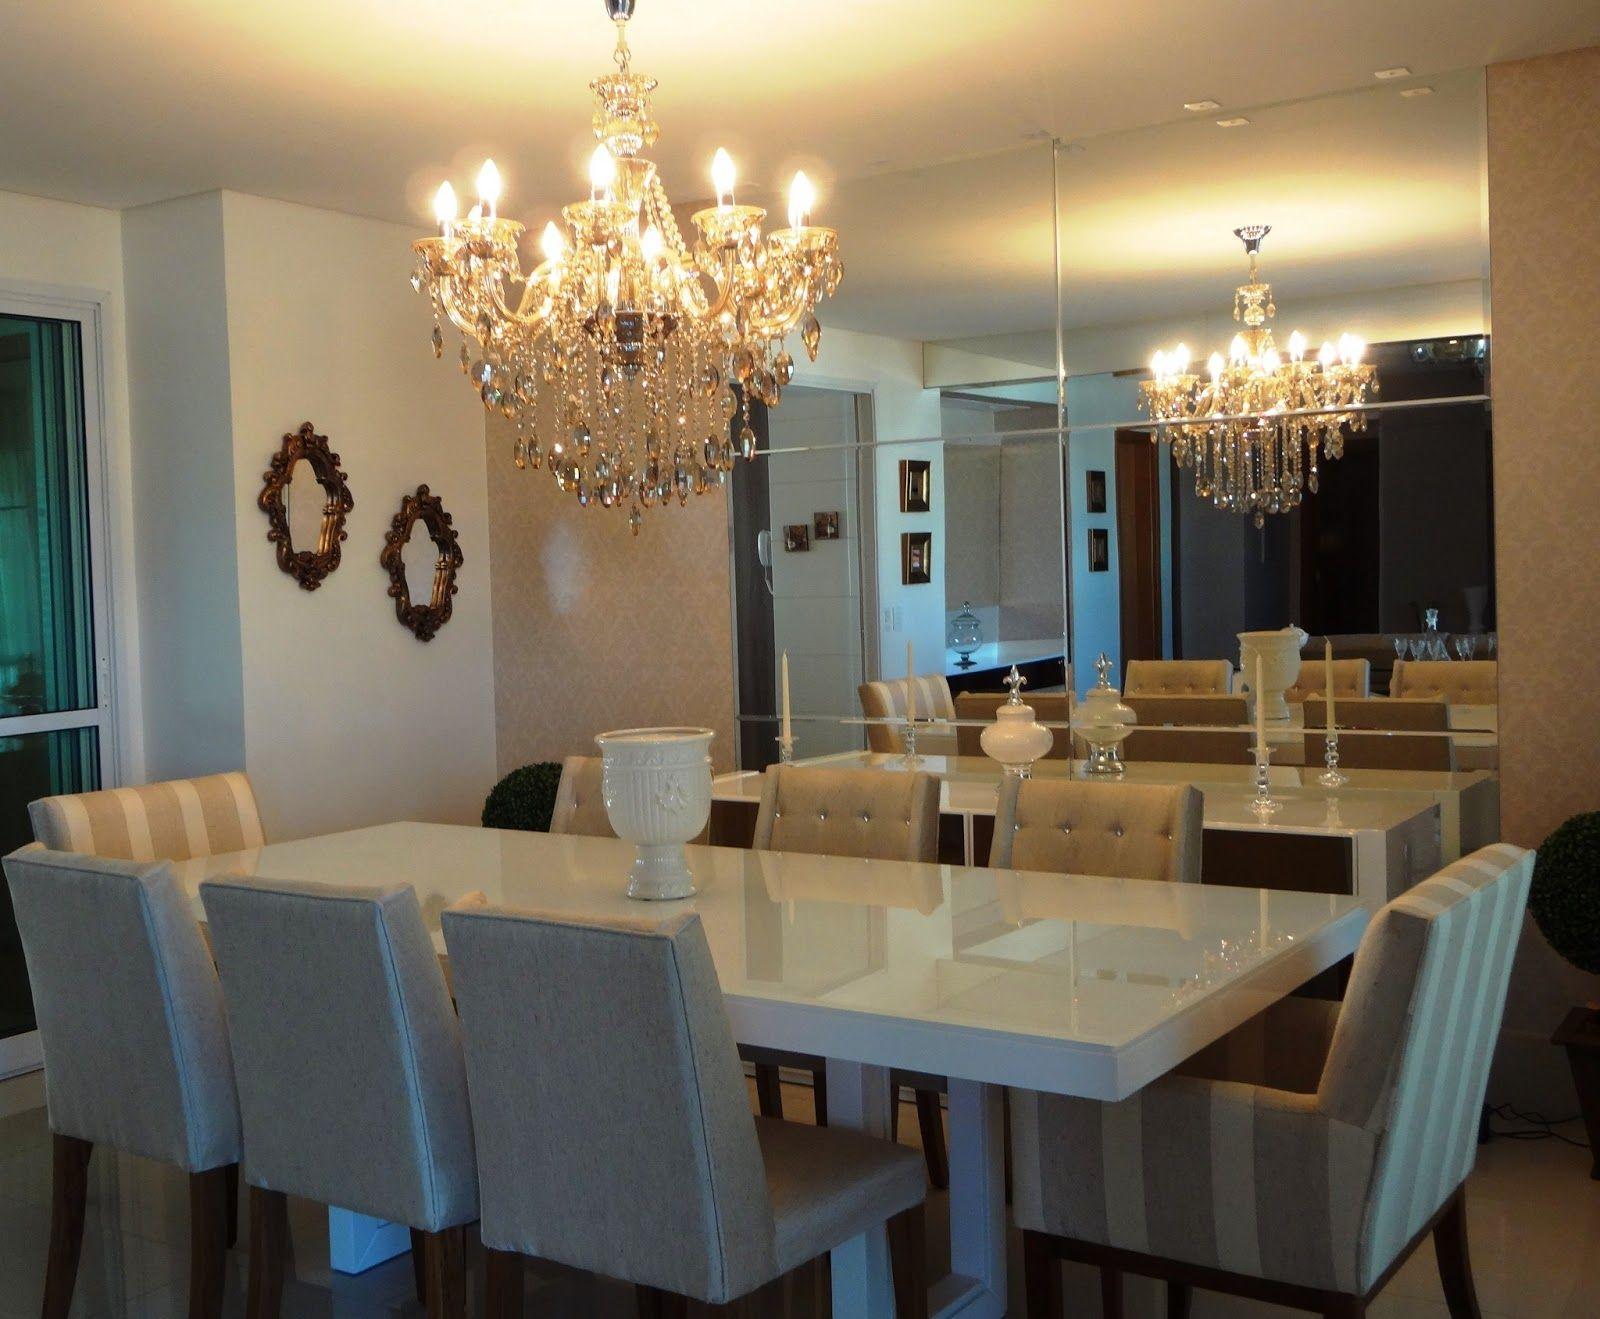 Adesivo De Madeira Para Mesa ~ 21 Salas de Jantar dos Sonhos com Buffet ou Aparador!!! Aparador, Armario buffet e Sala de jantar